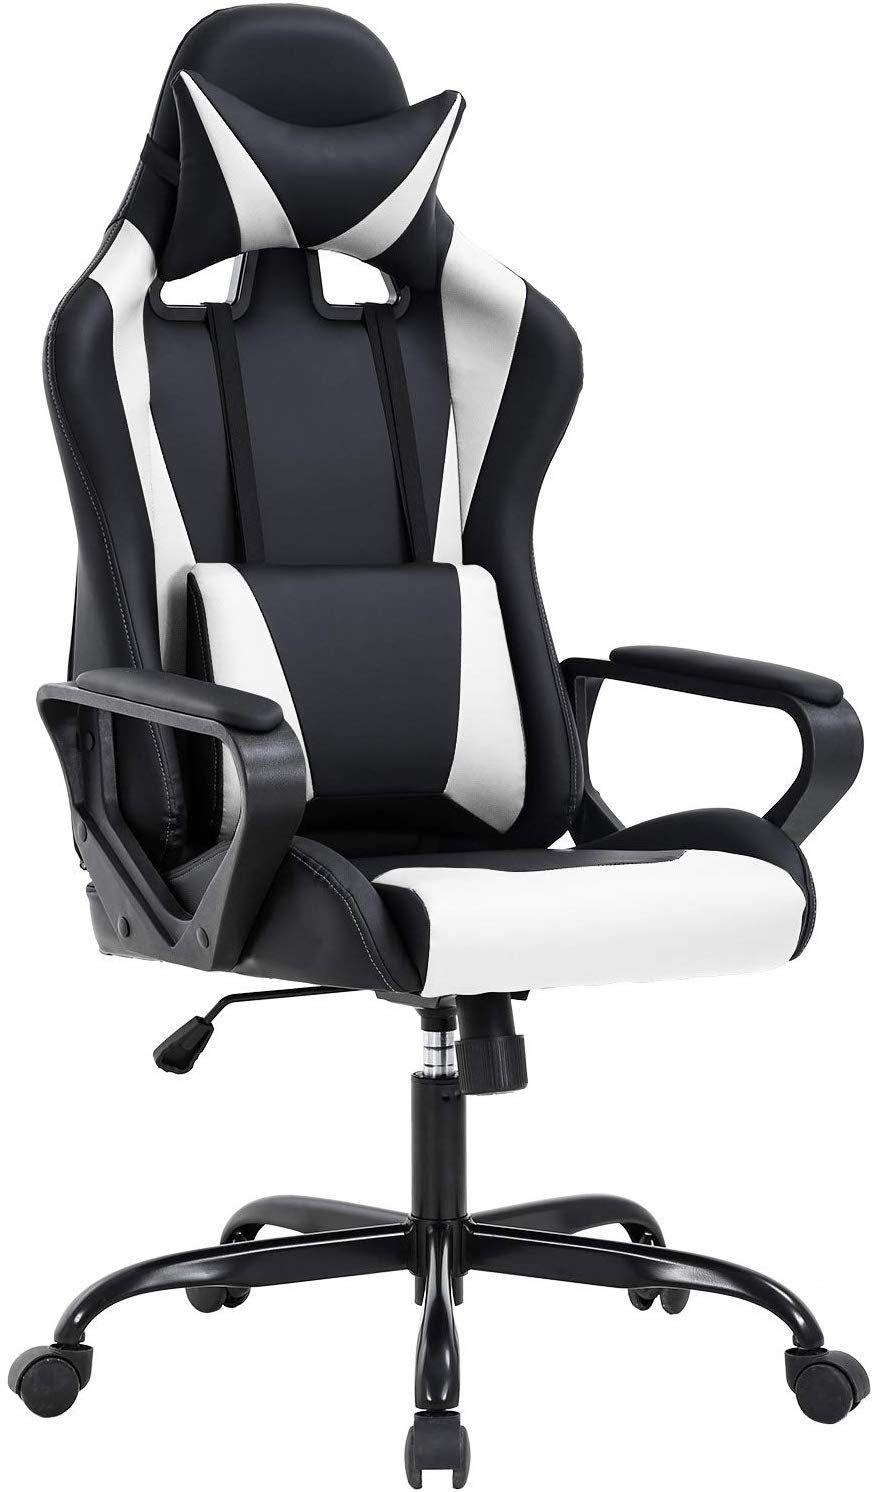 Highback gaming chair pc chair computer racing chair pu